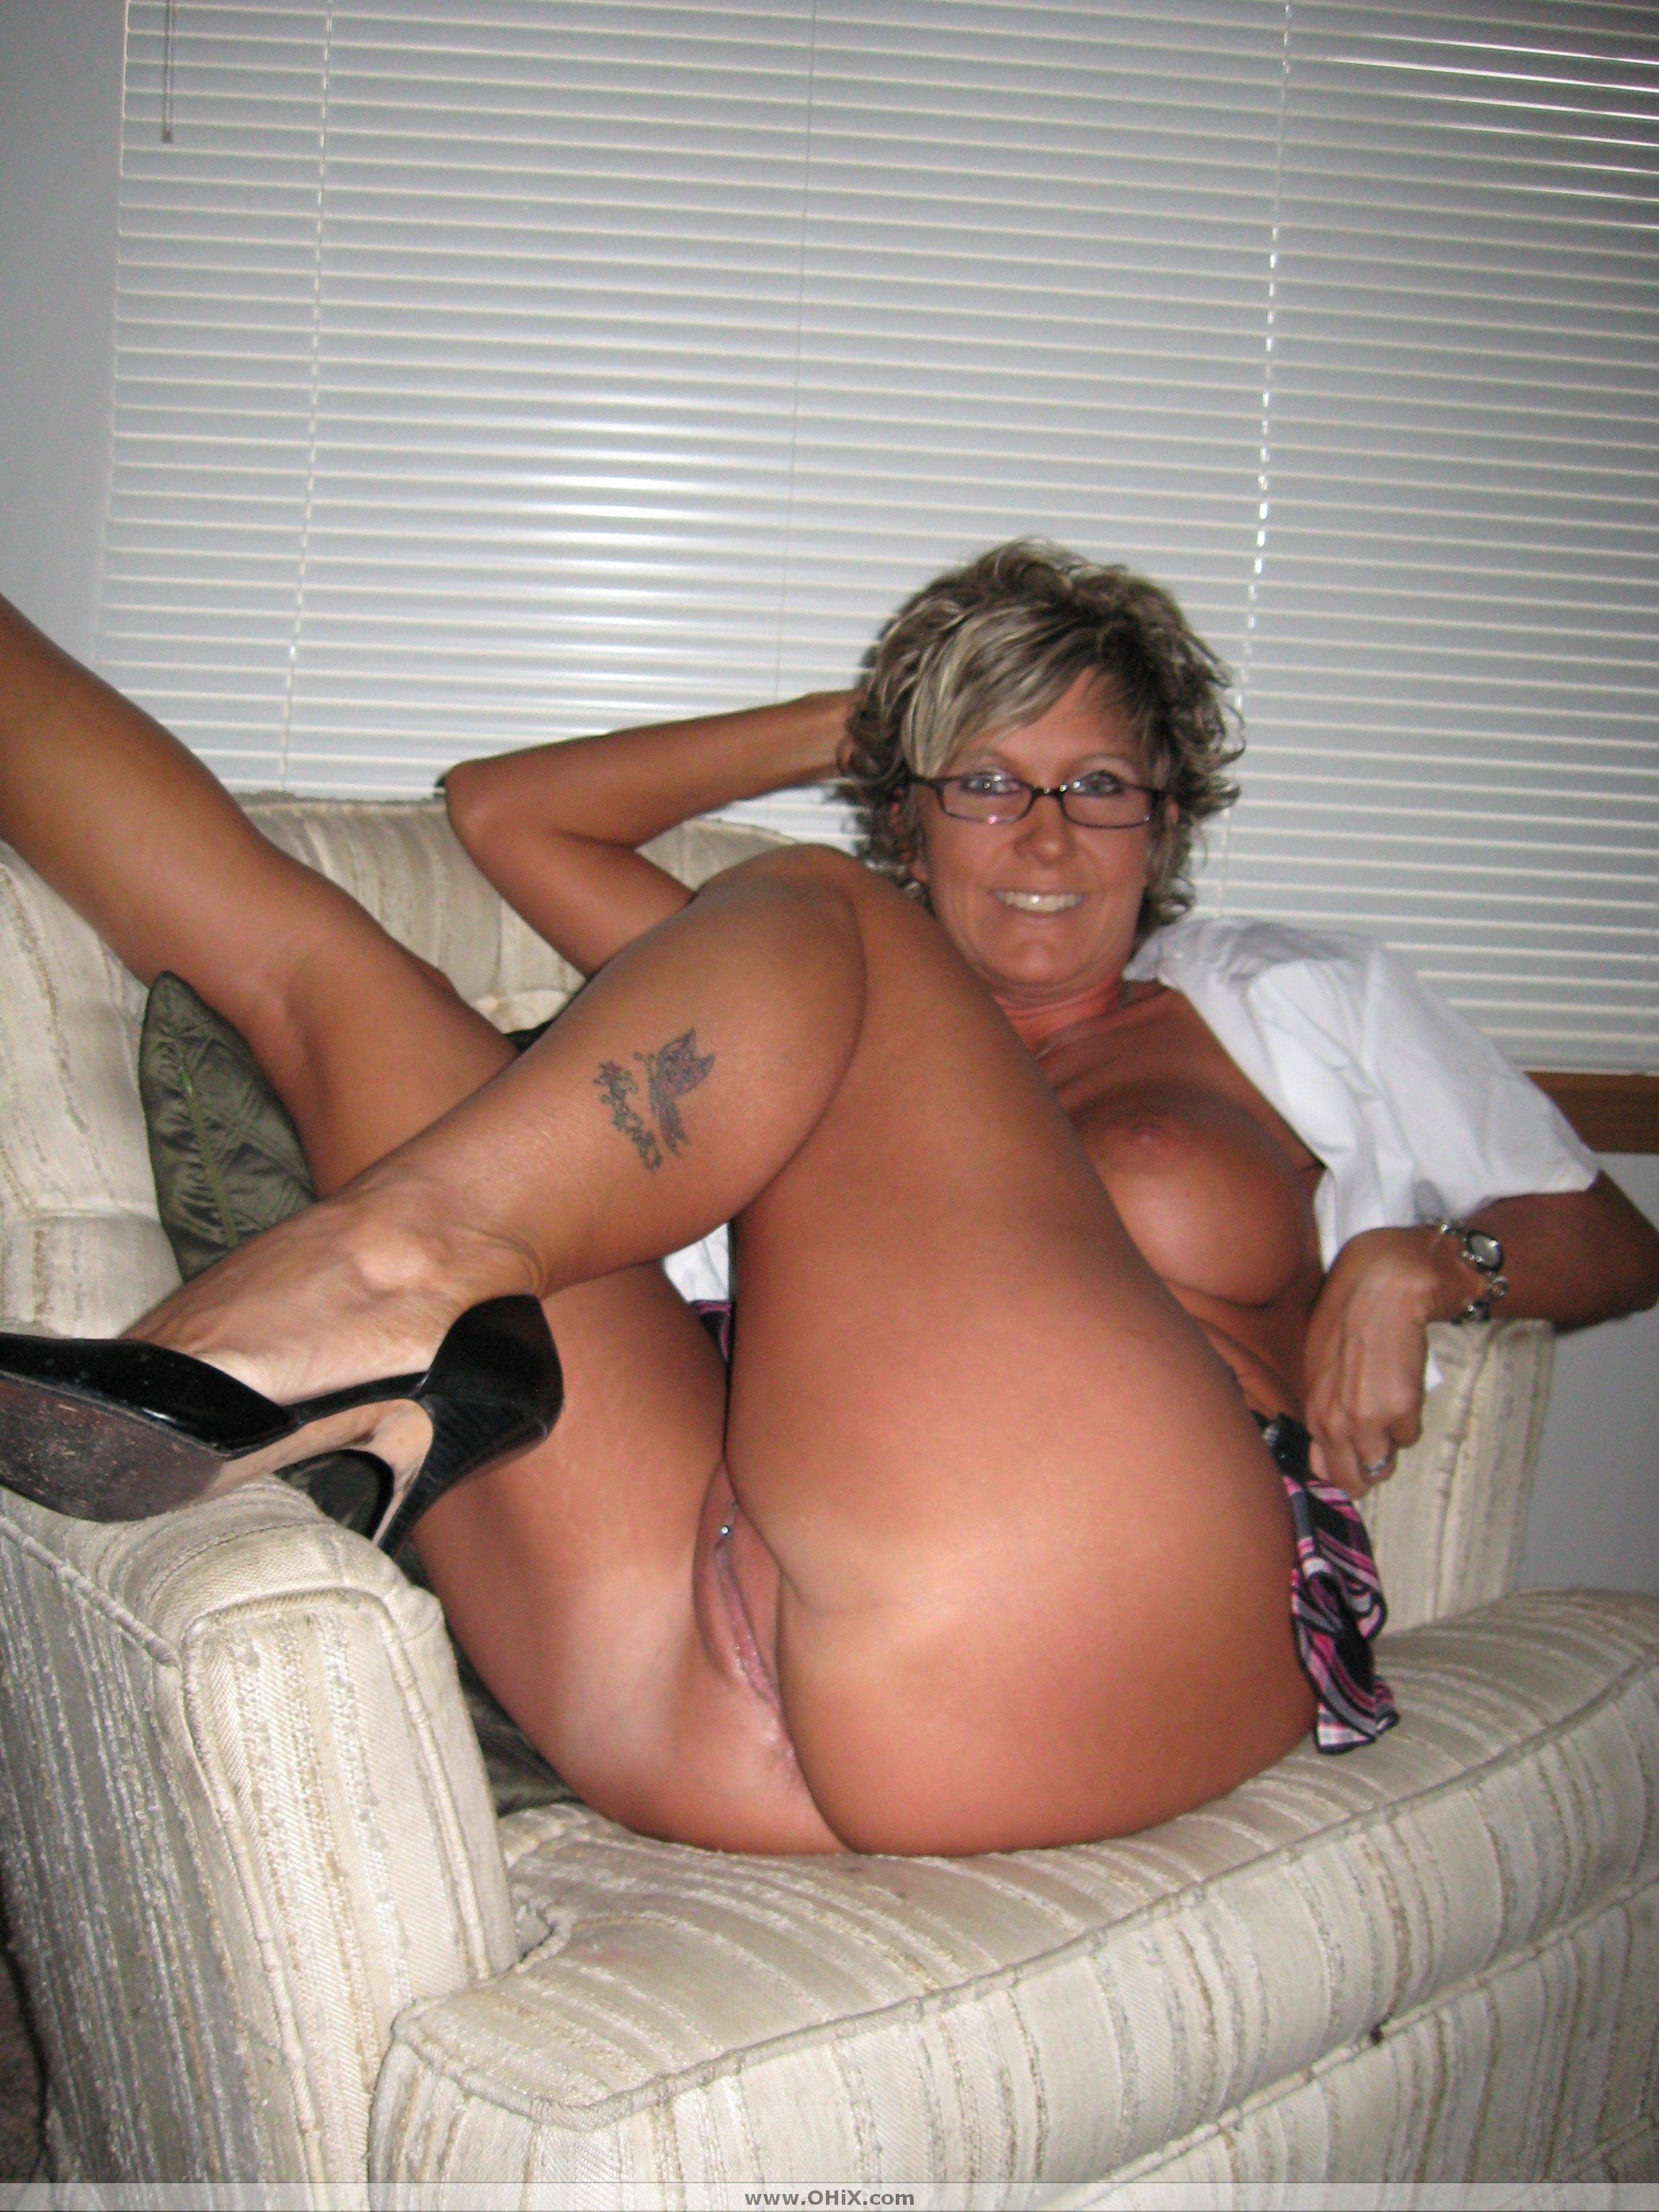 Girls love big dick